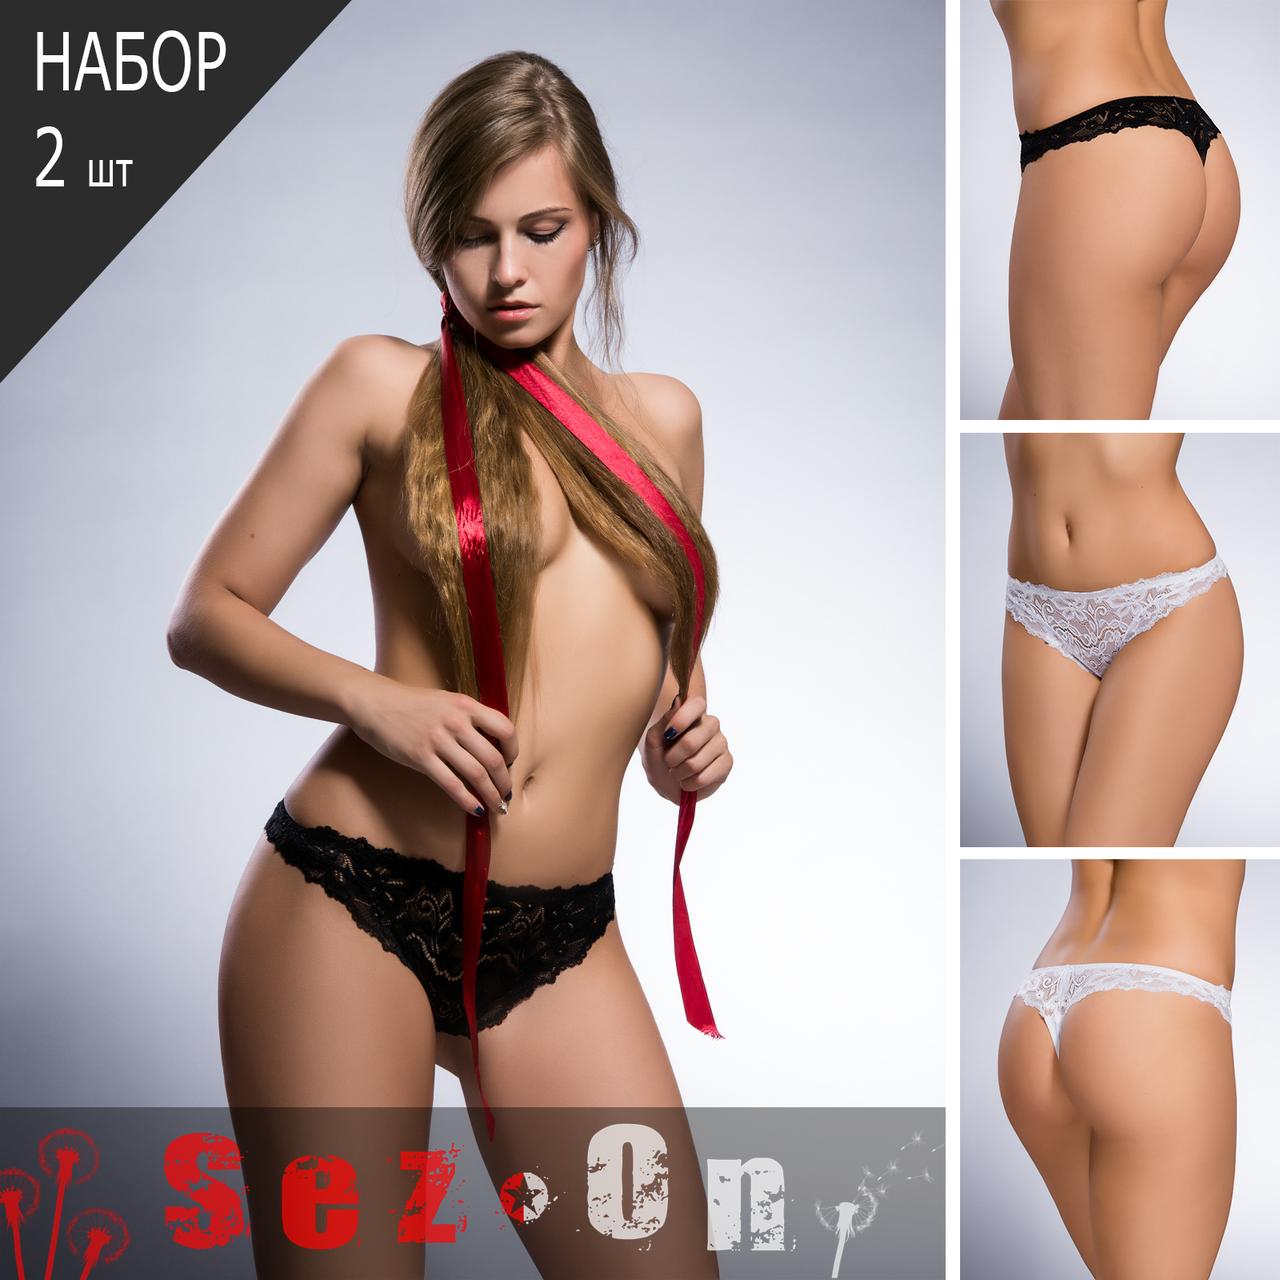 7e9e98aad5415 Трусы женские стринги кружевные Acousma T2028H - 2 шт. (оптом), цена ...